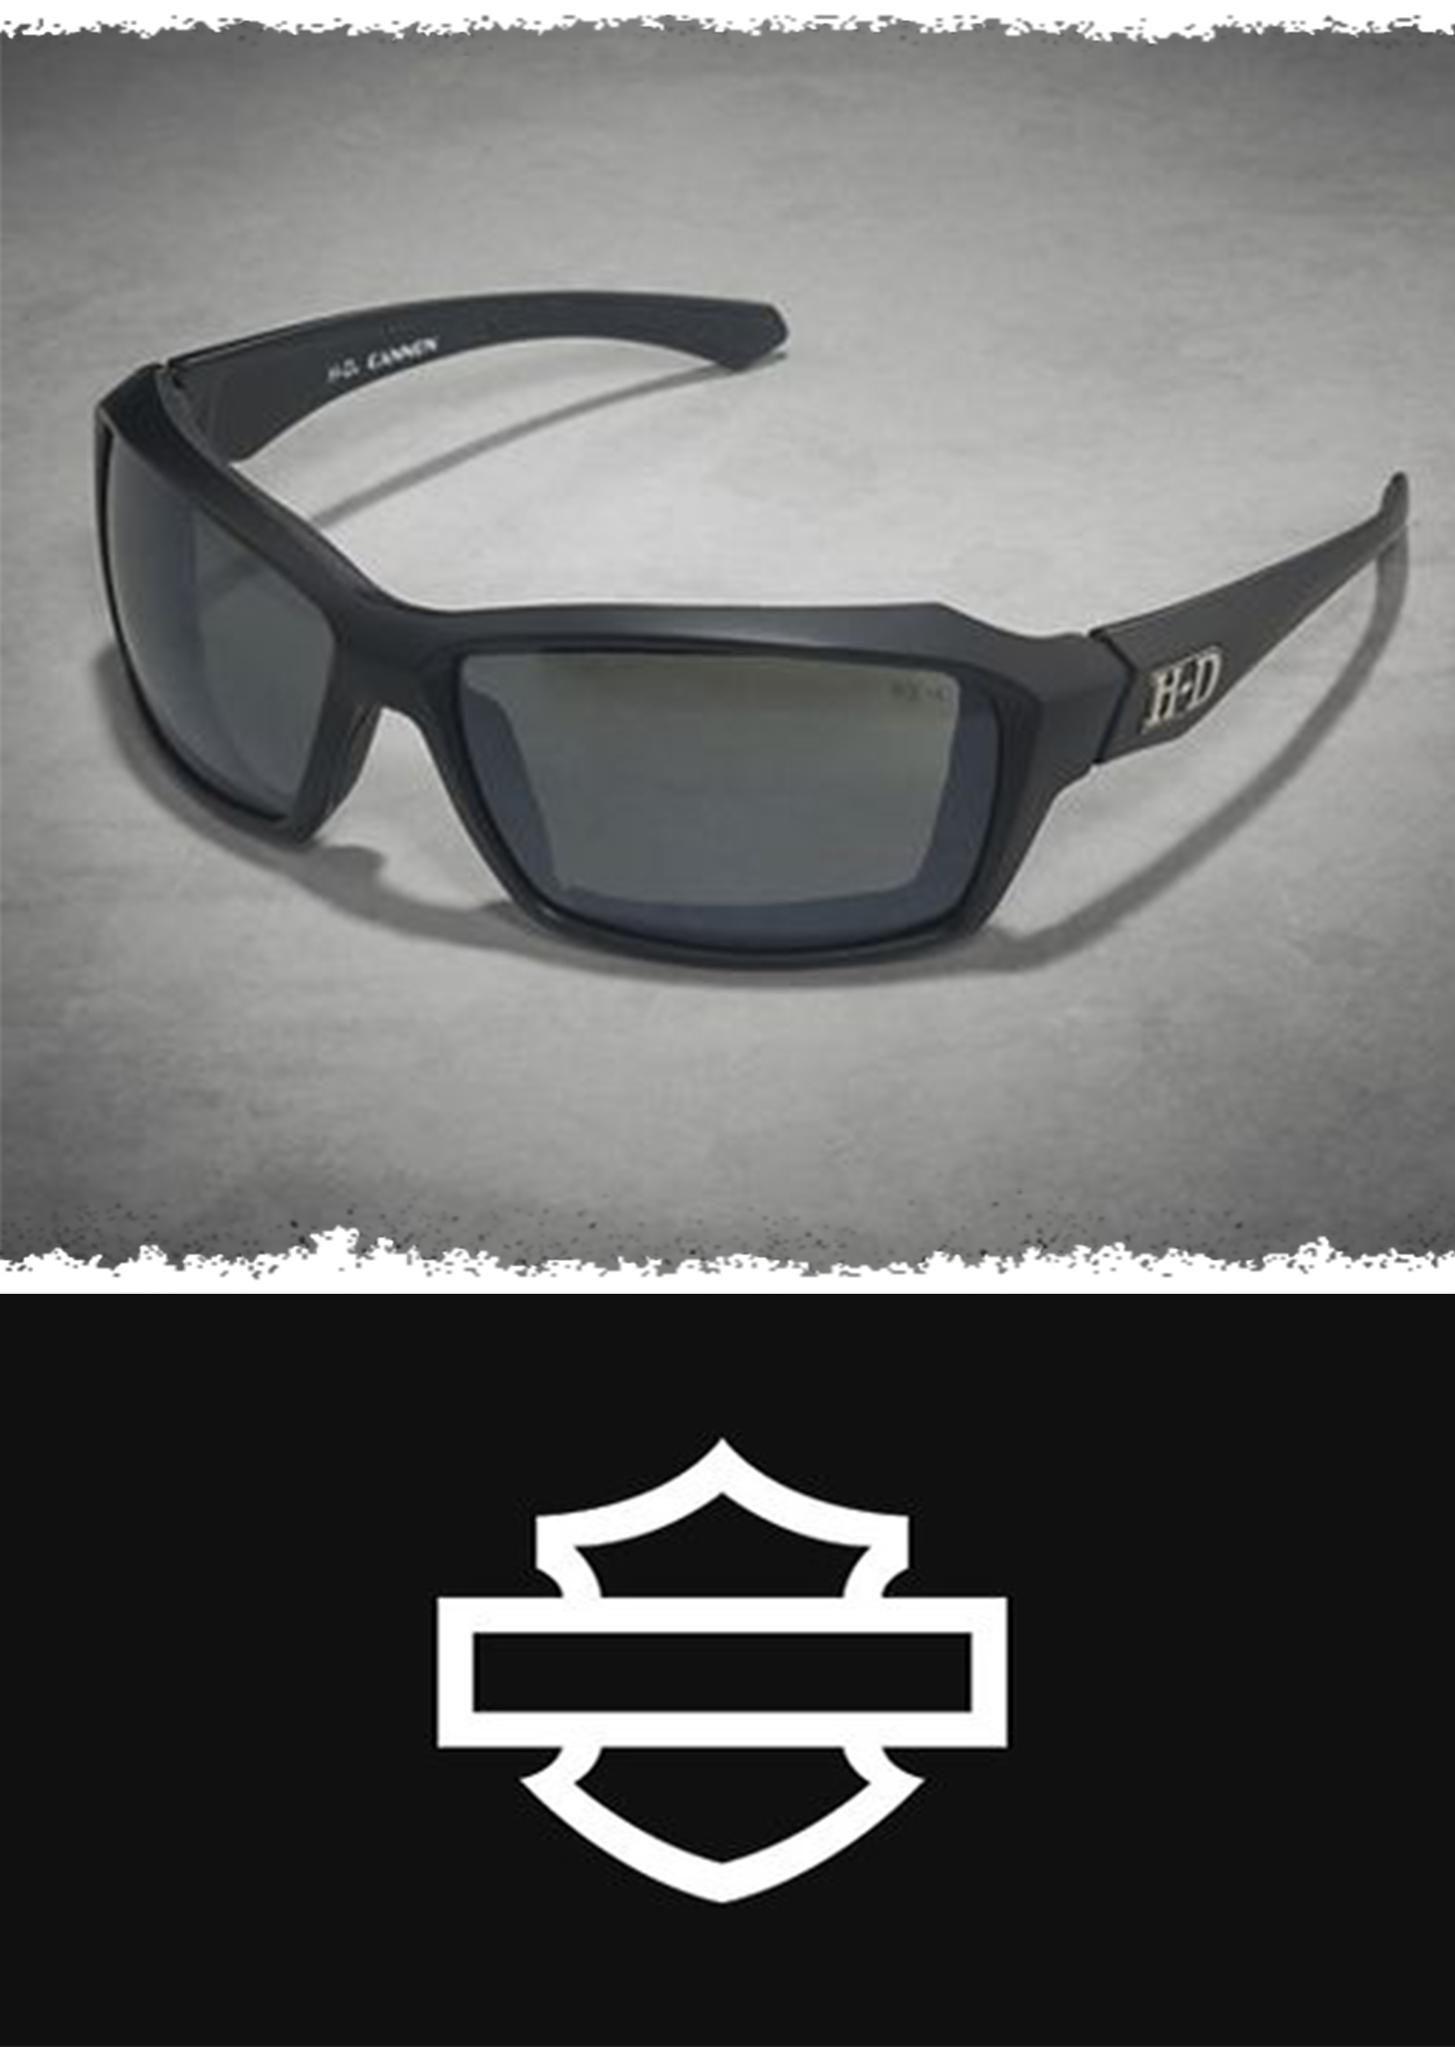 57a112a3e92d Cannon Silver Flash Performance Sunglasses | H-D Gear For Him ...